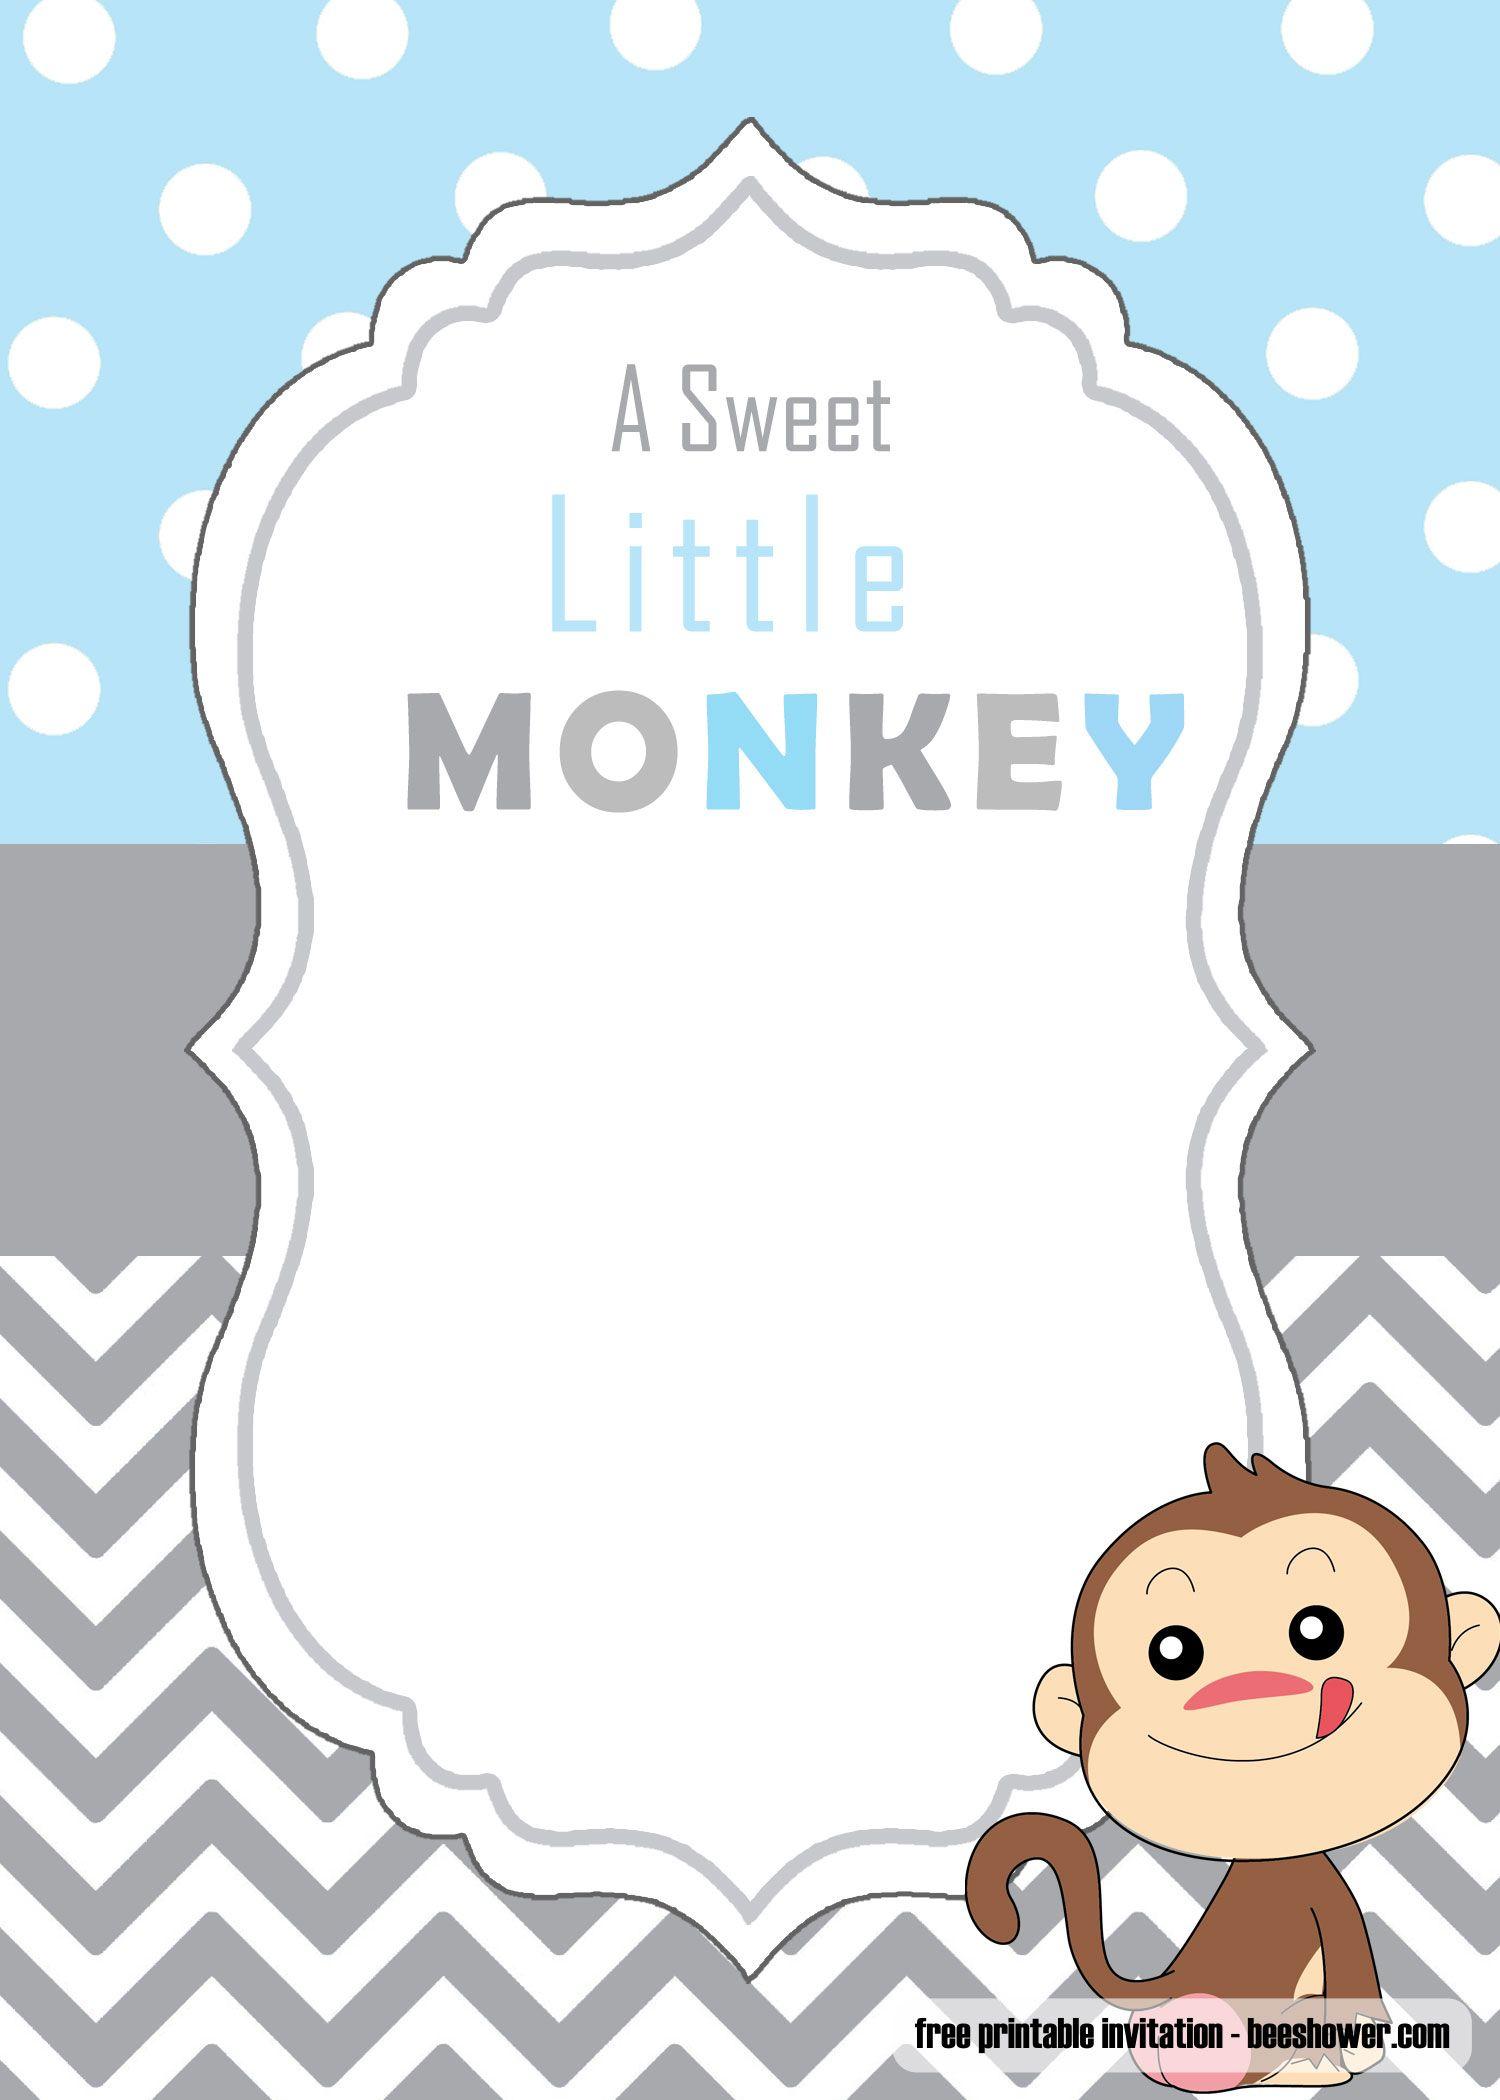 Get Free Cute Monkey Baby Shower Invitations Templates Monkey Baby Shower Invitations Baby Shower Invitations Free Printable Baby Shower Invitations